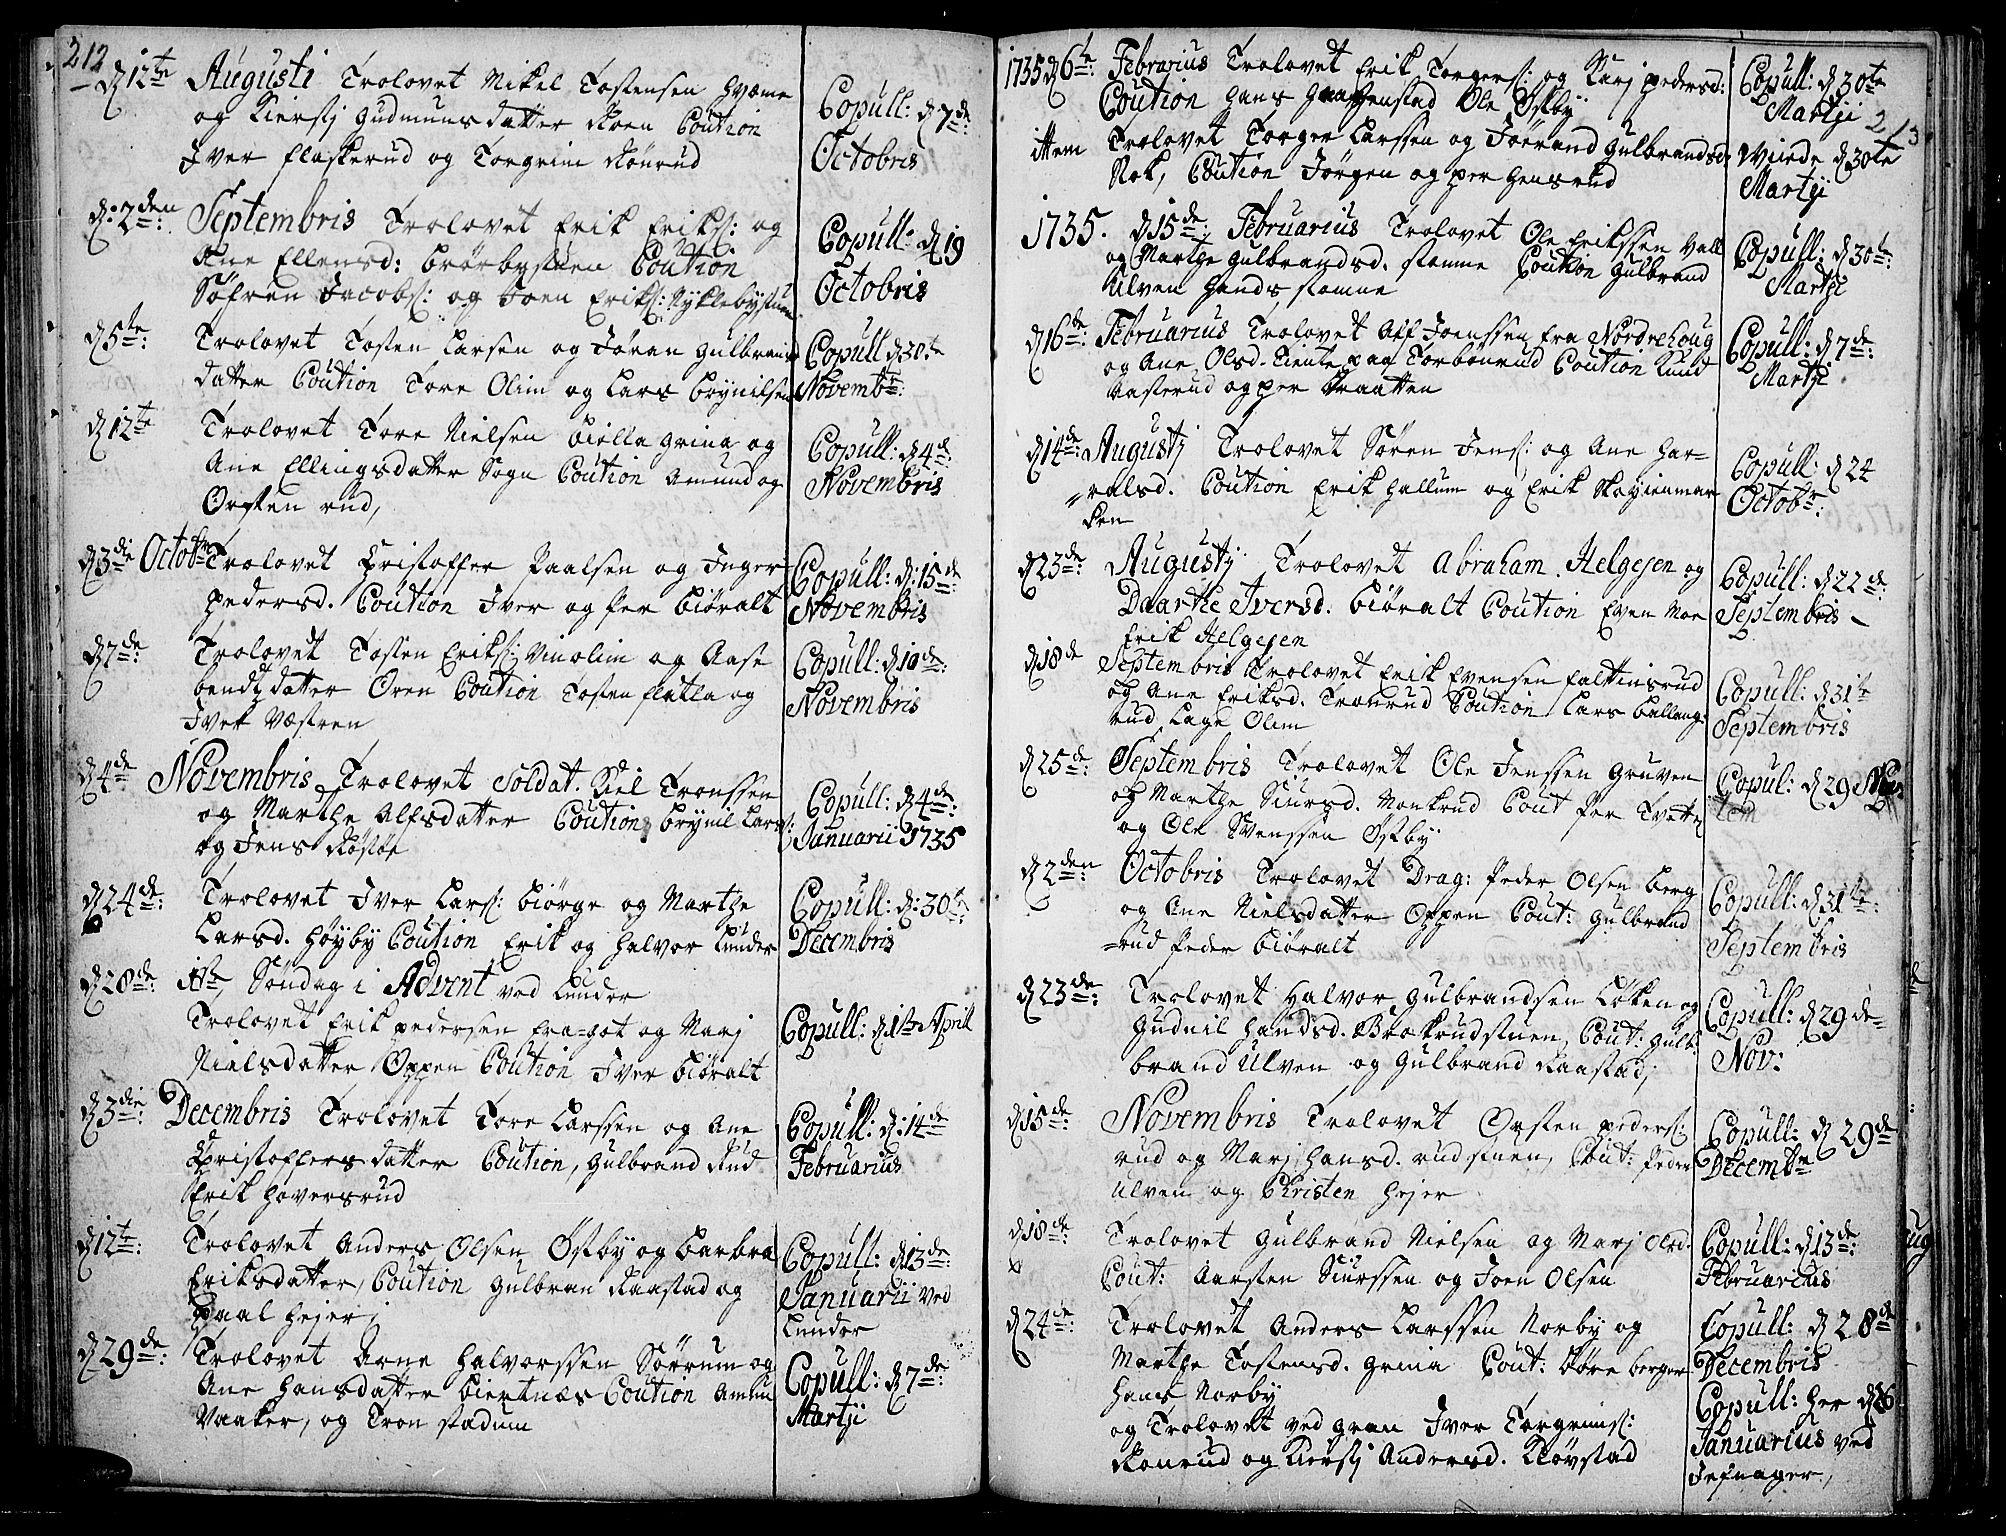 SAH, Jevnaker prestekontor, Ministerialbok nr. 2, 1725-1751, s. 212-213